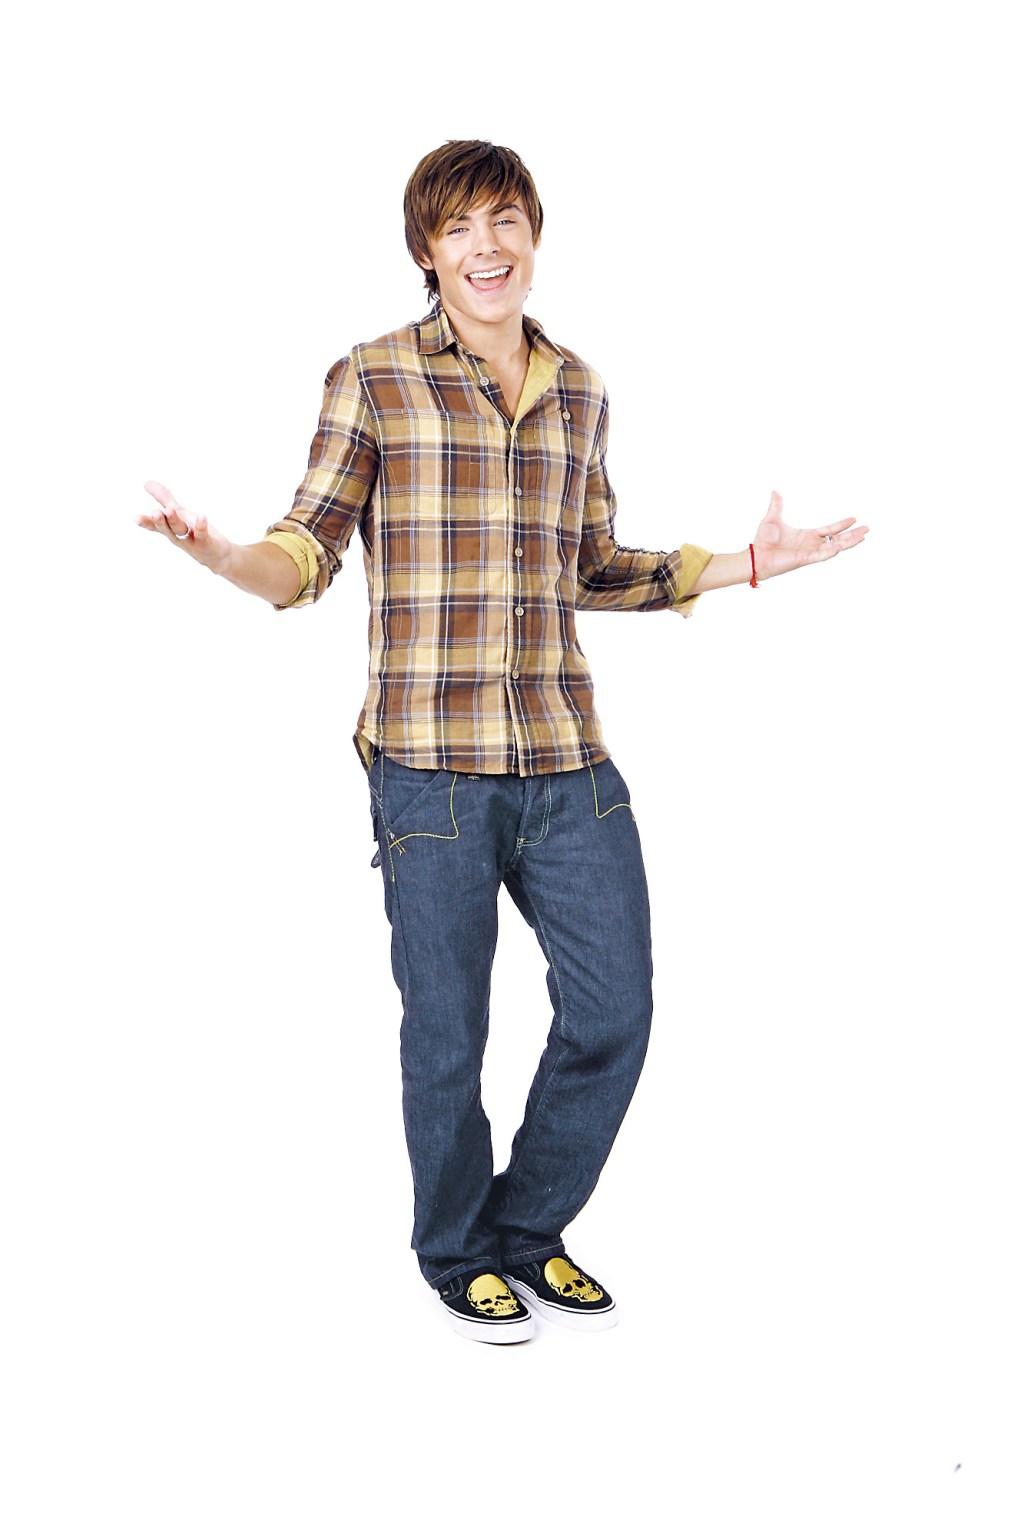 High School Musical star Zac Efron.